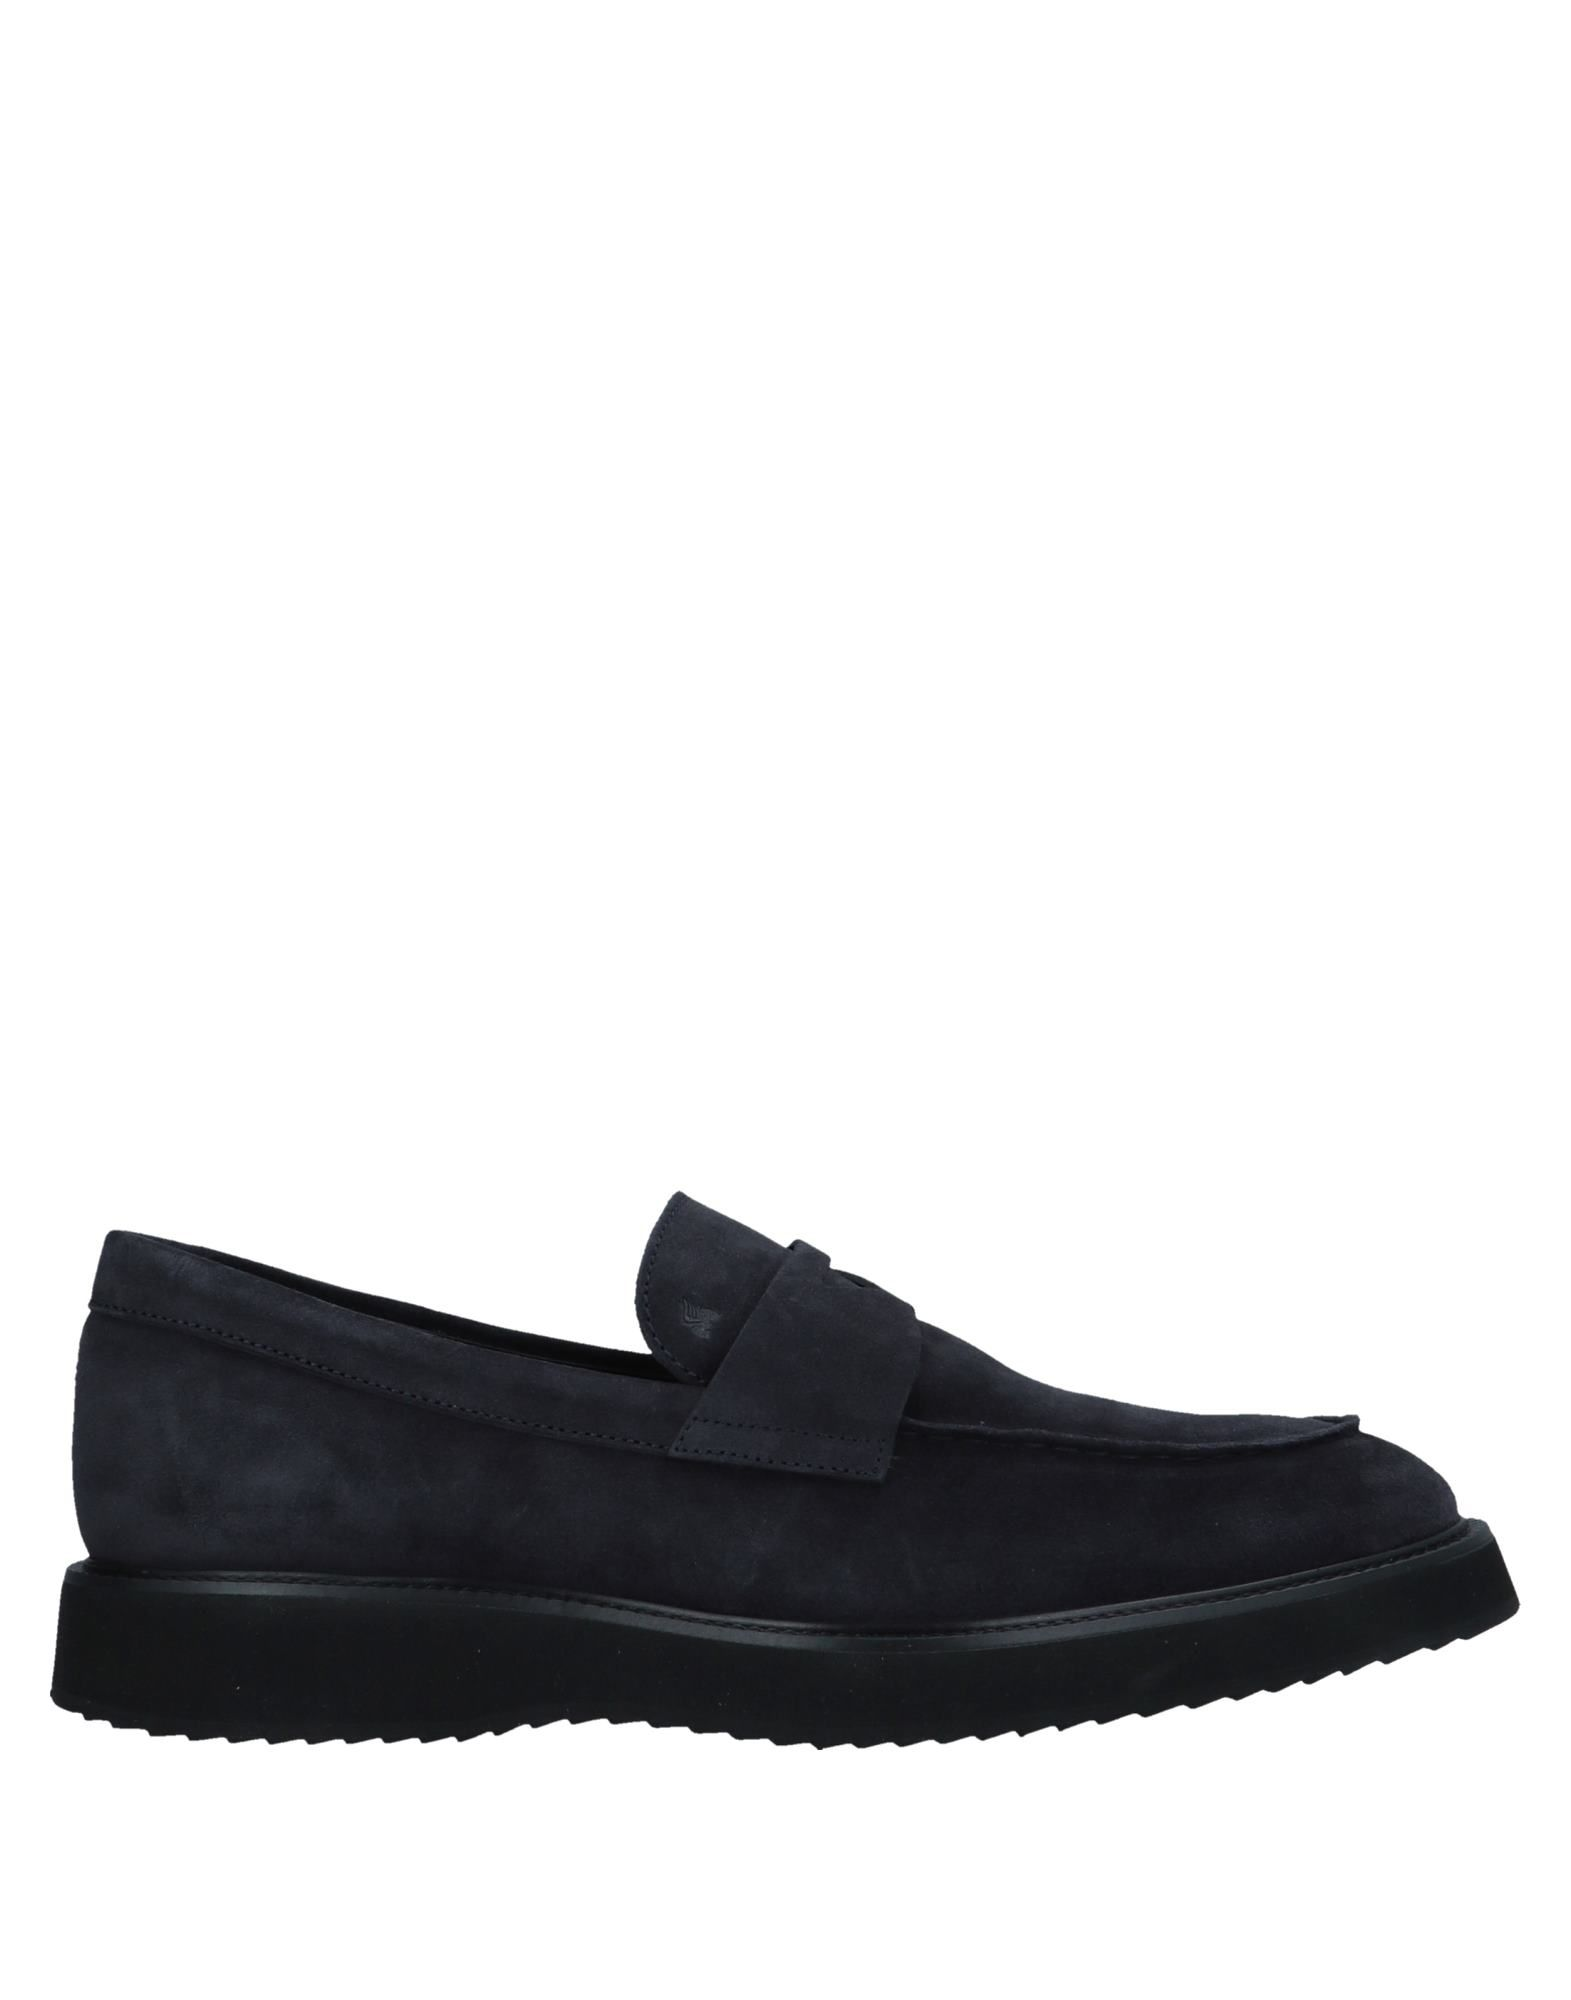 Hogan Mokassins Herren  11541411EV Gute Qualität beliebte Schuhe